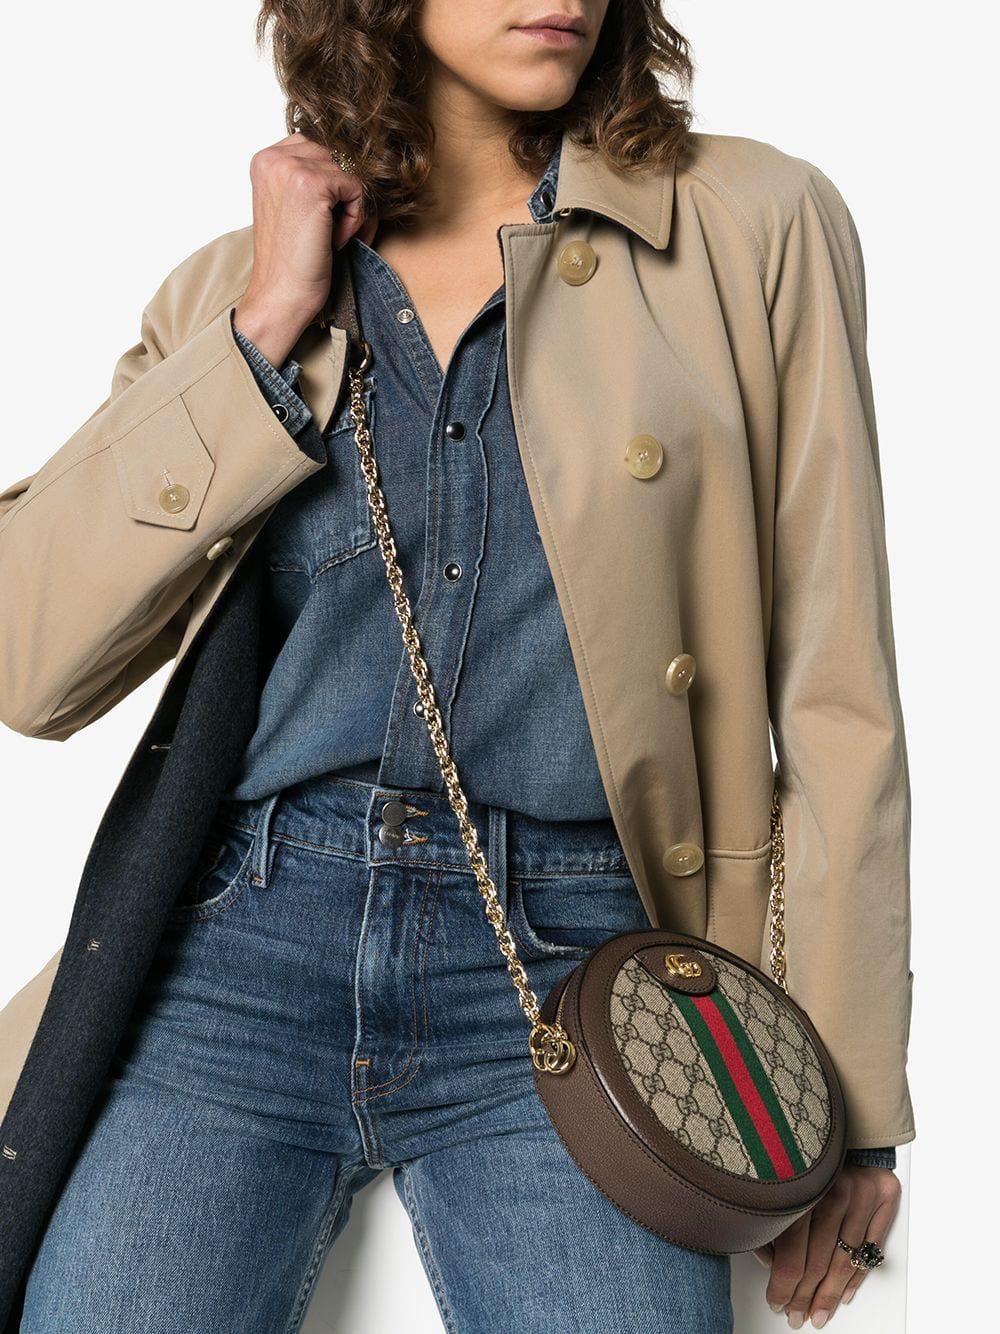 ea39f9742 Gucci Ophidia Mini Gg Round Shoulder Bag In Neutrals   ModeSens